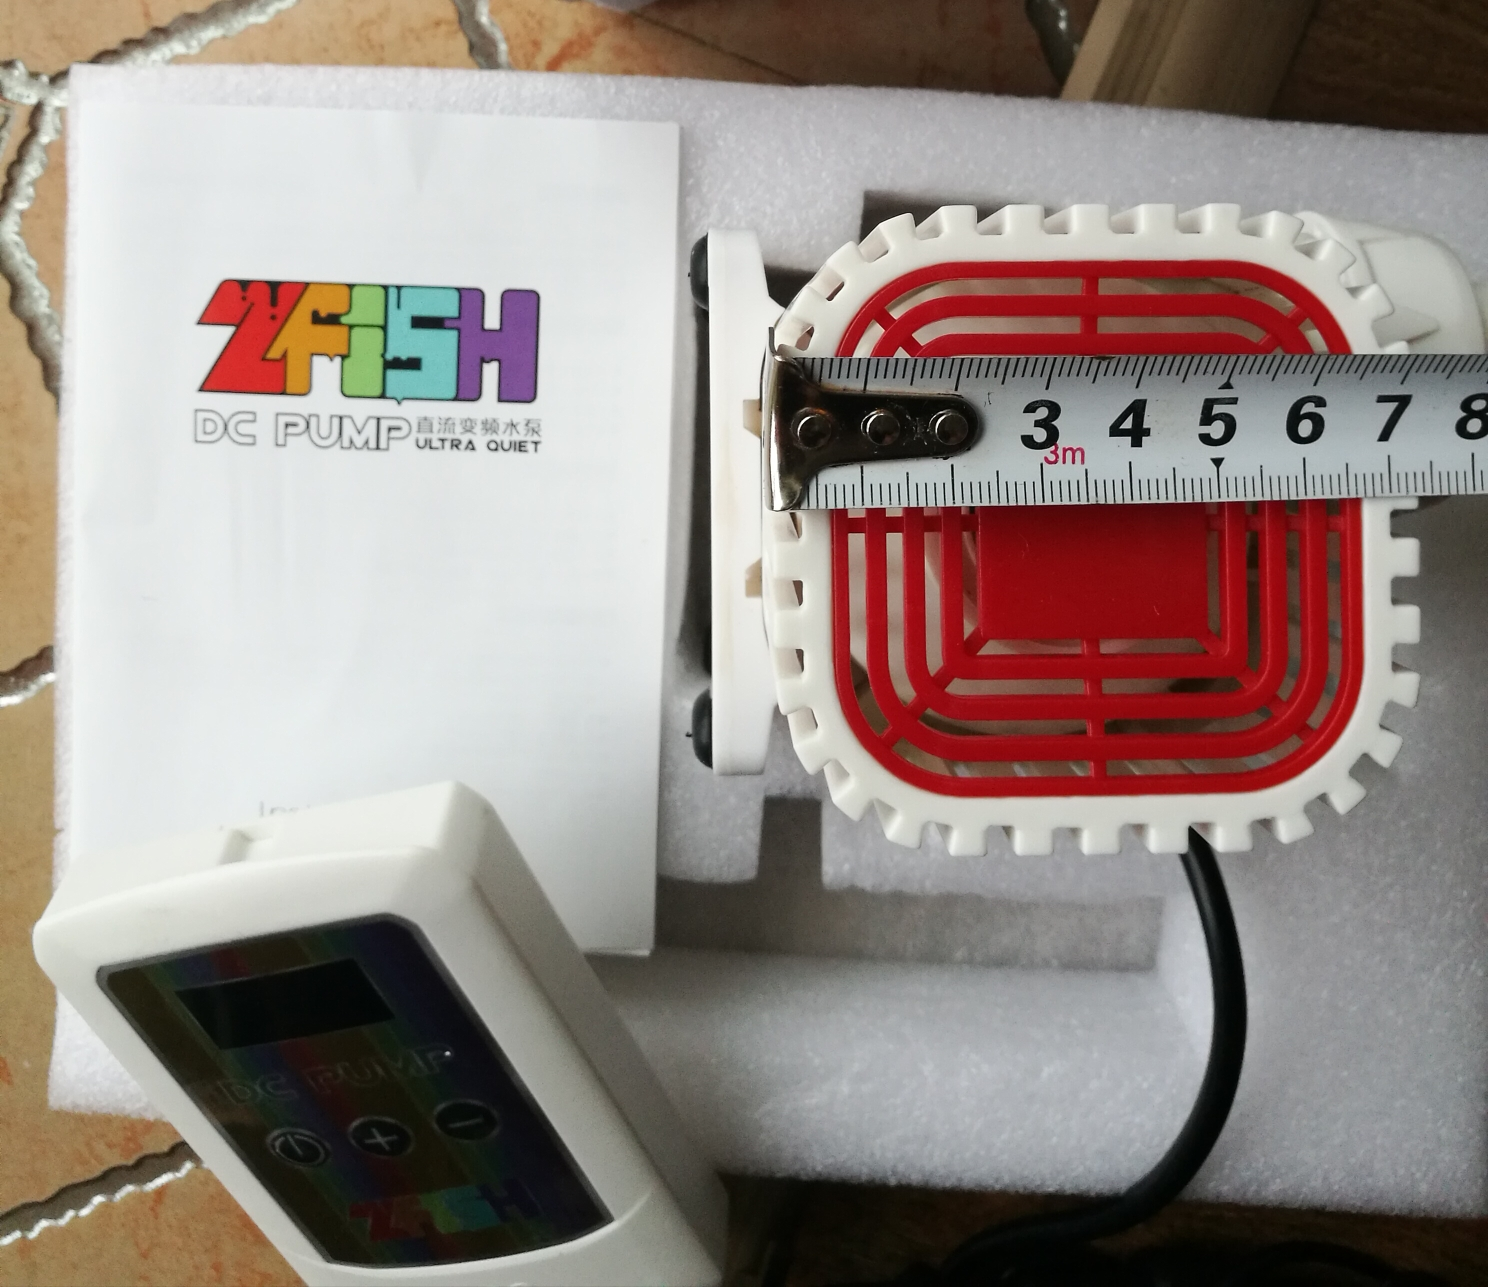 ZFISH变频水泵试用报告 北京龙鱼论坛 北京龙鱼第38张